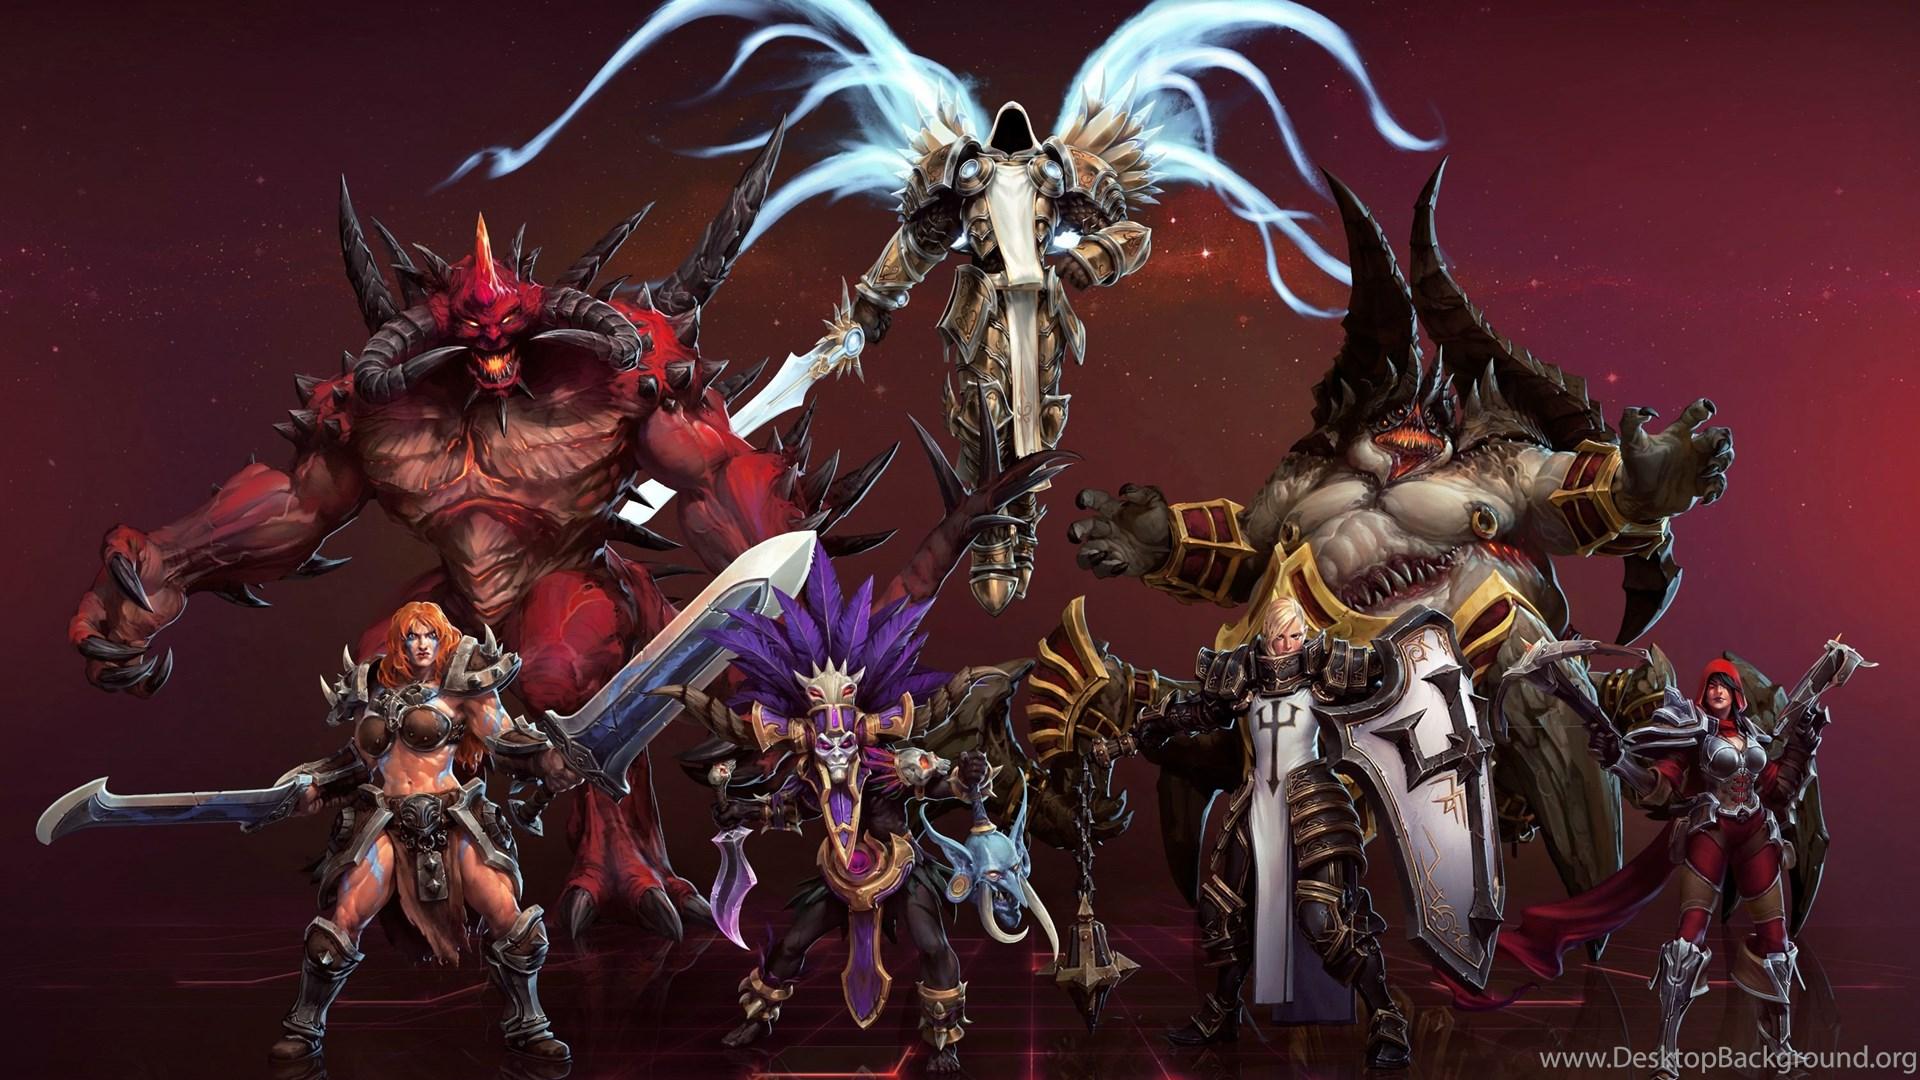 Heroes Of The Storm Wallpapers Hd Backgrounds Download Desktop